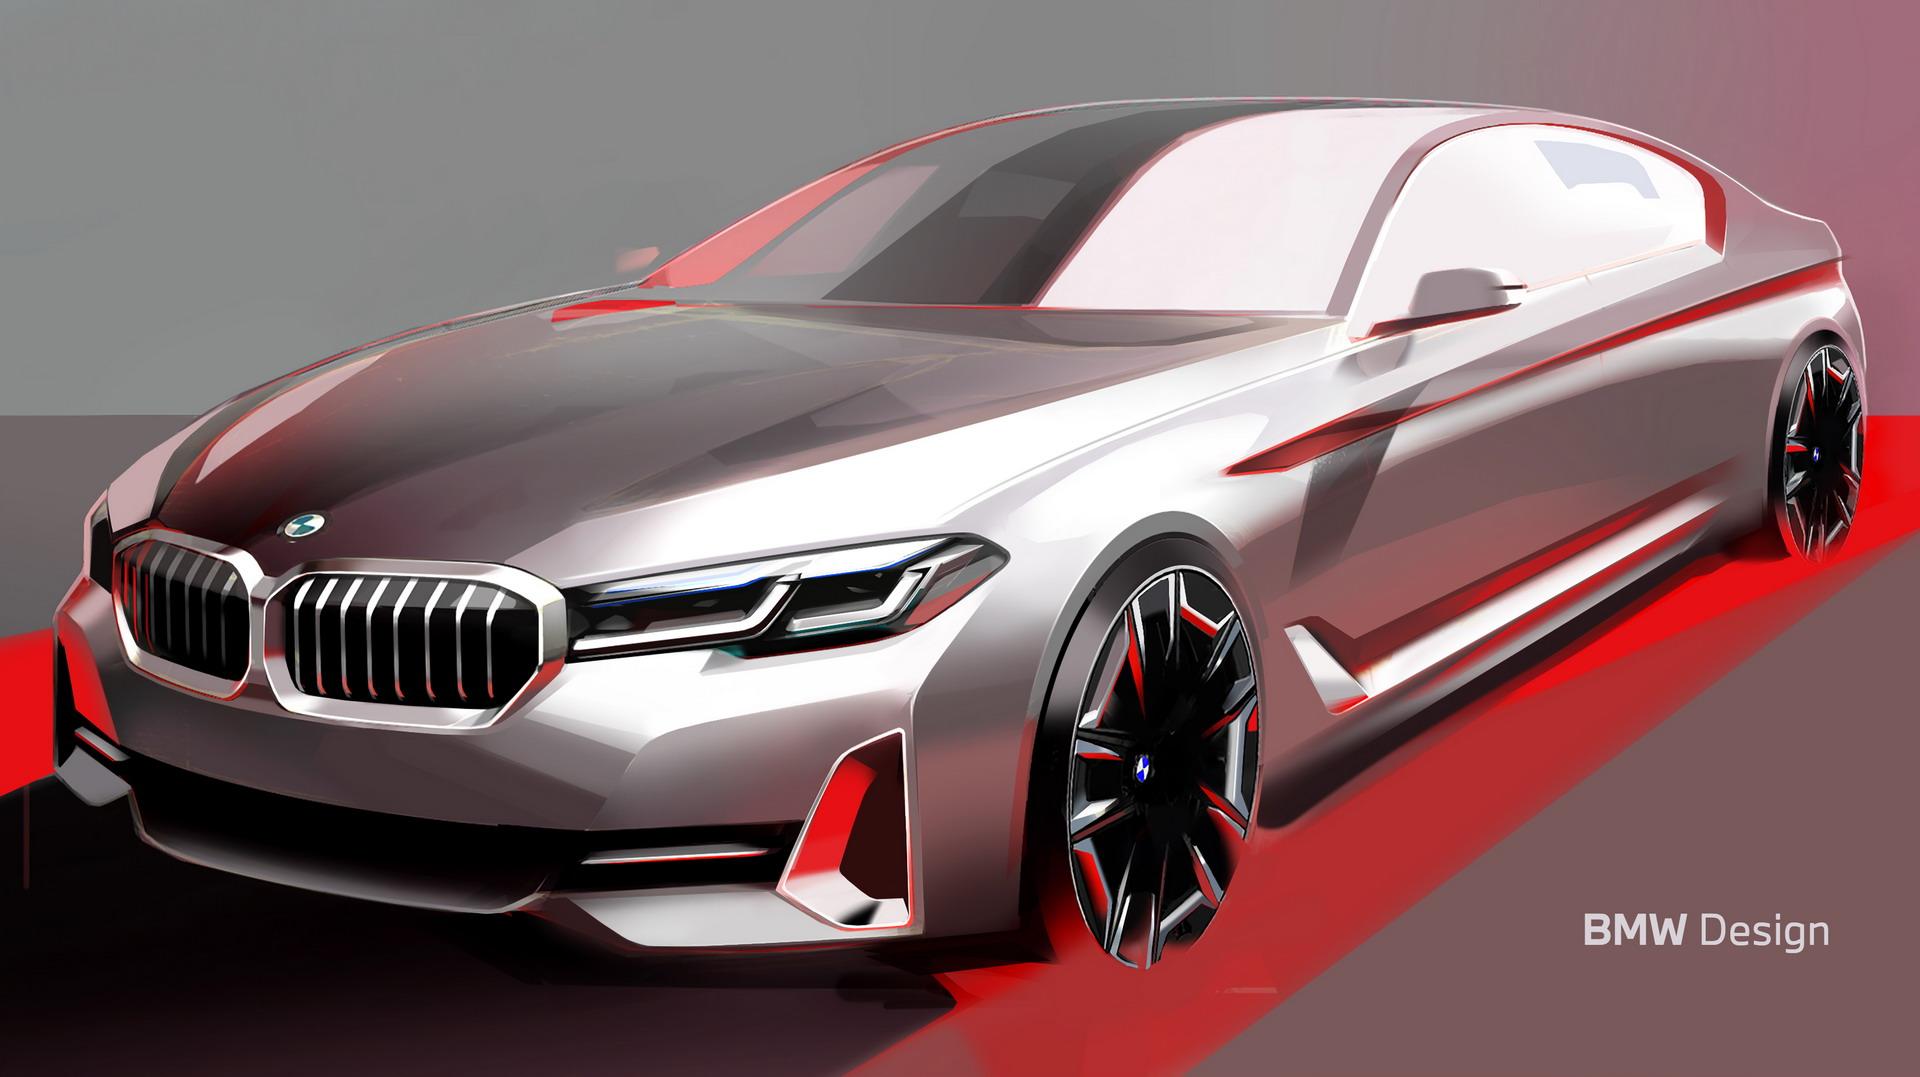 The New BMW 5 Series LCI Design Sketch 1